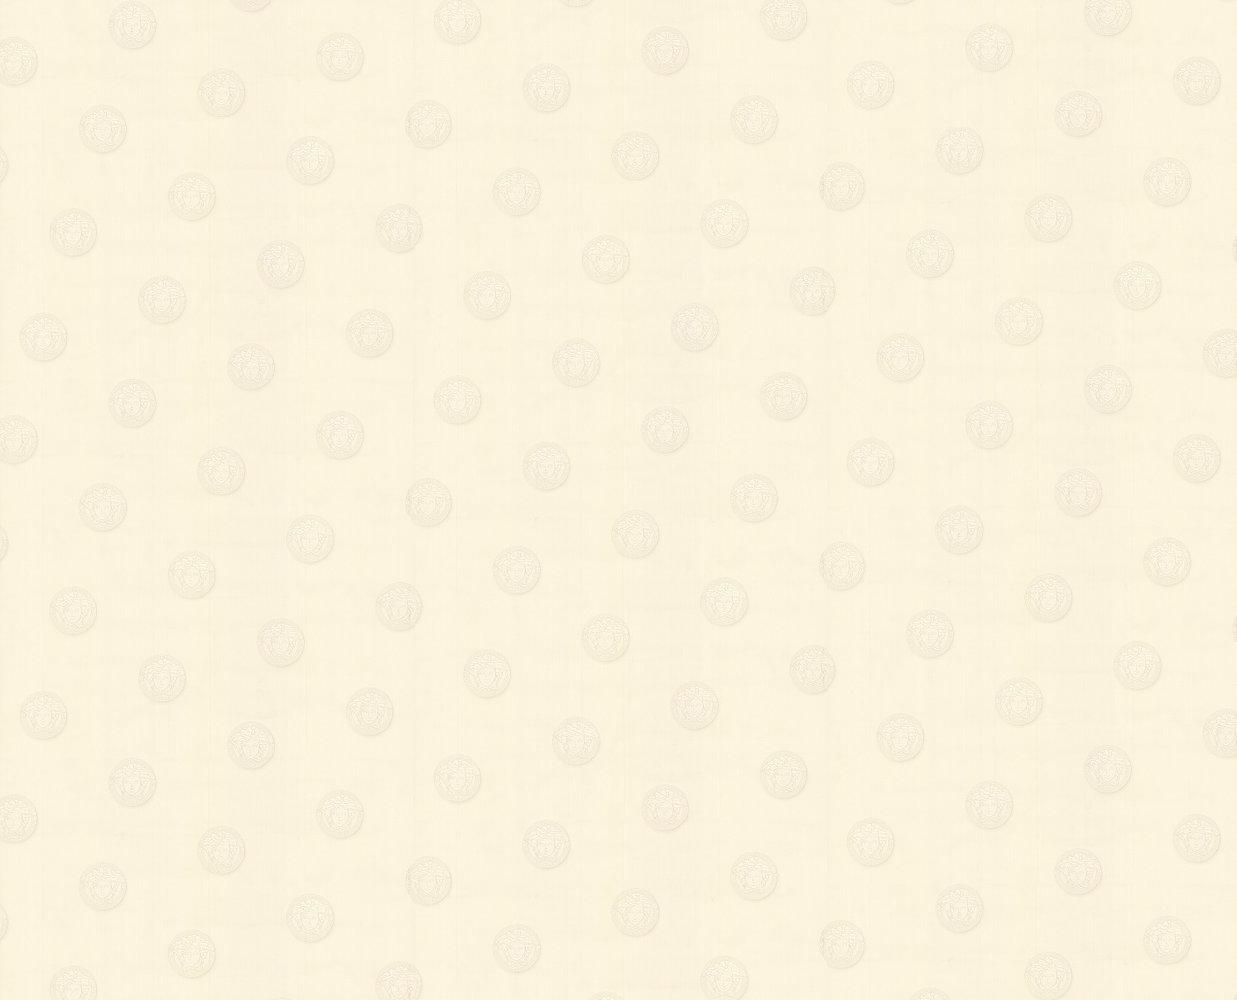 Versace Classic Motif Cream Wallpaper - Product code: 34862-1